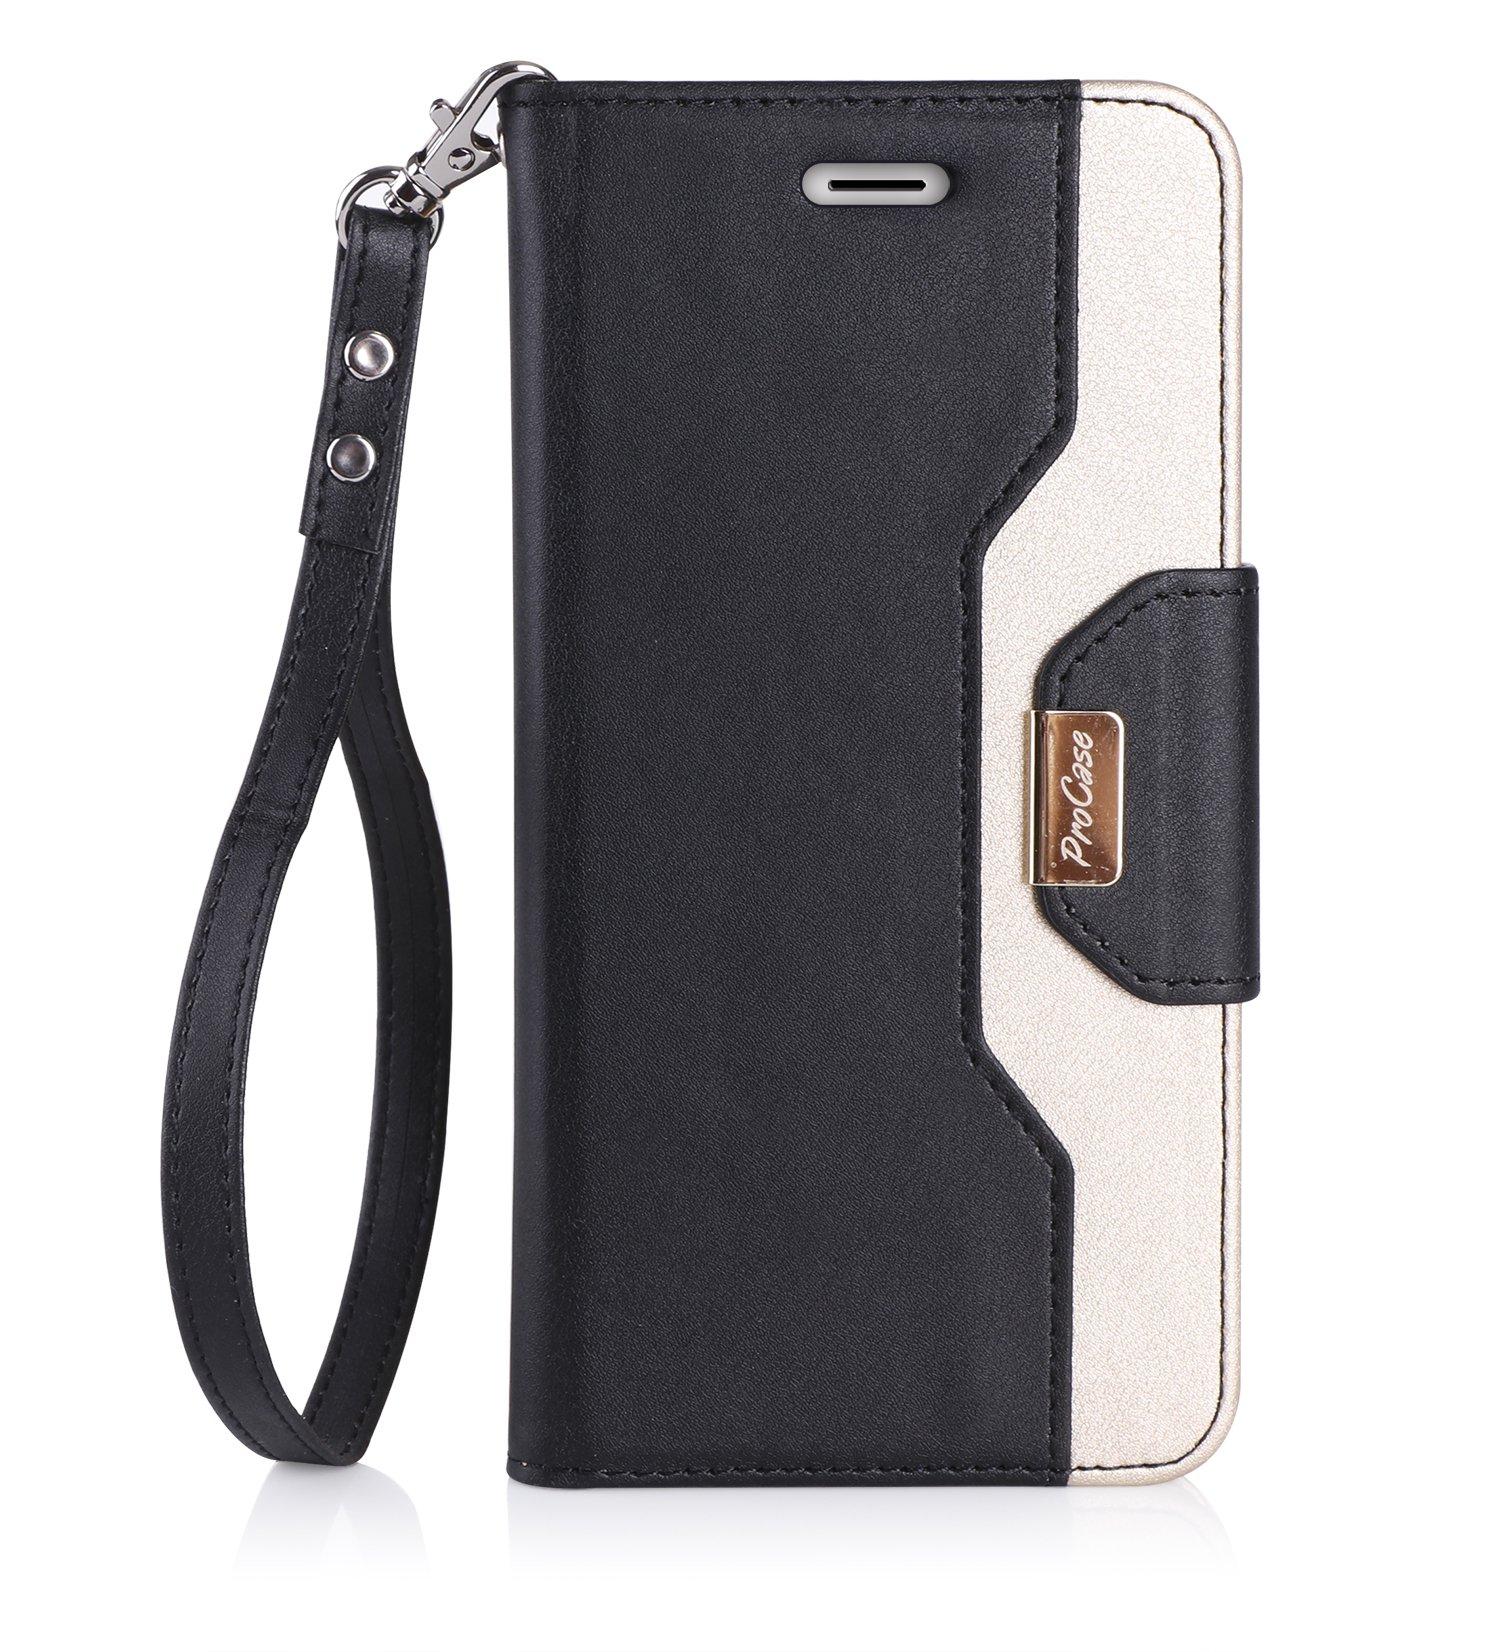 Cell Phone Cases | Amazon.com